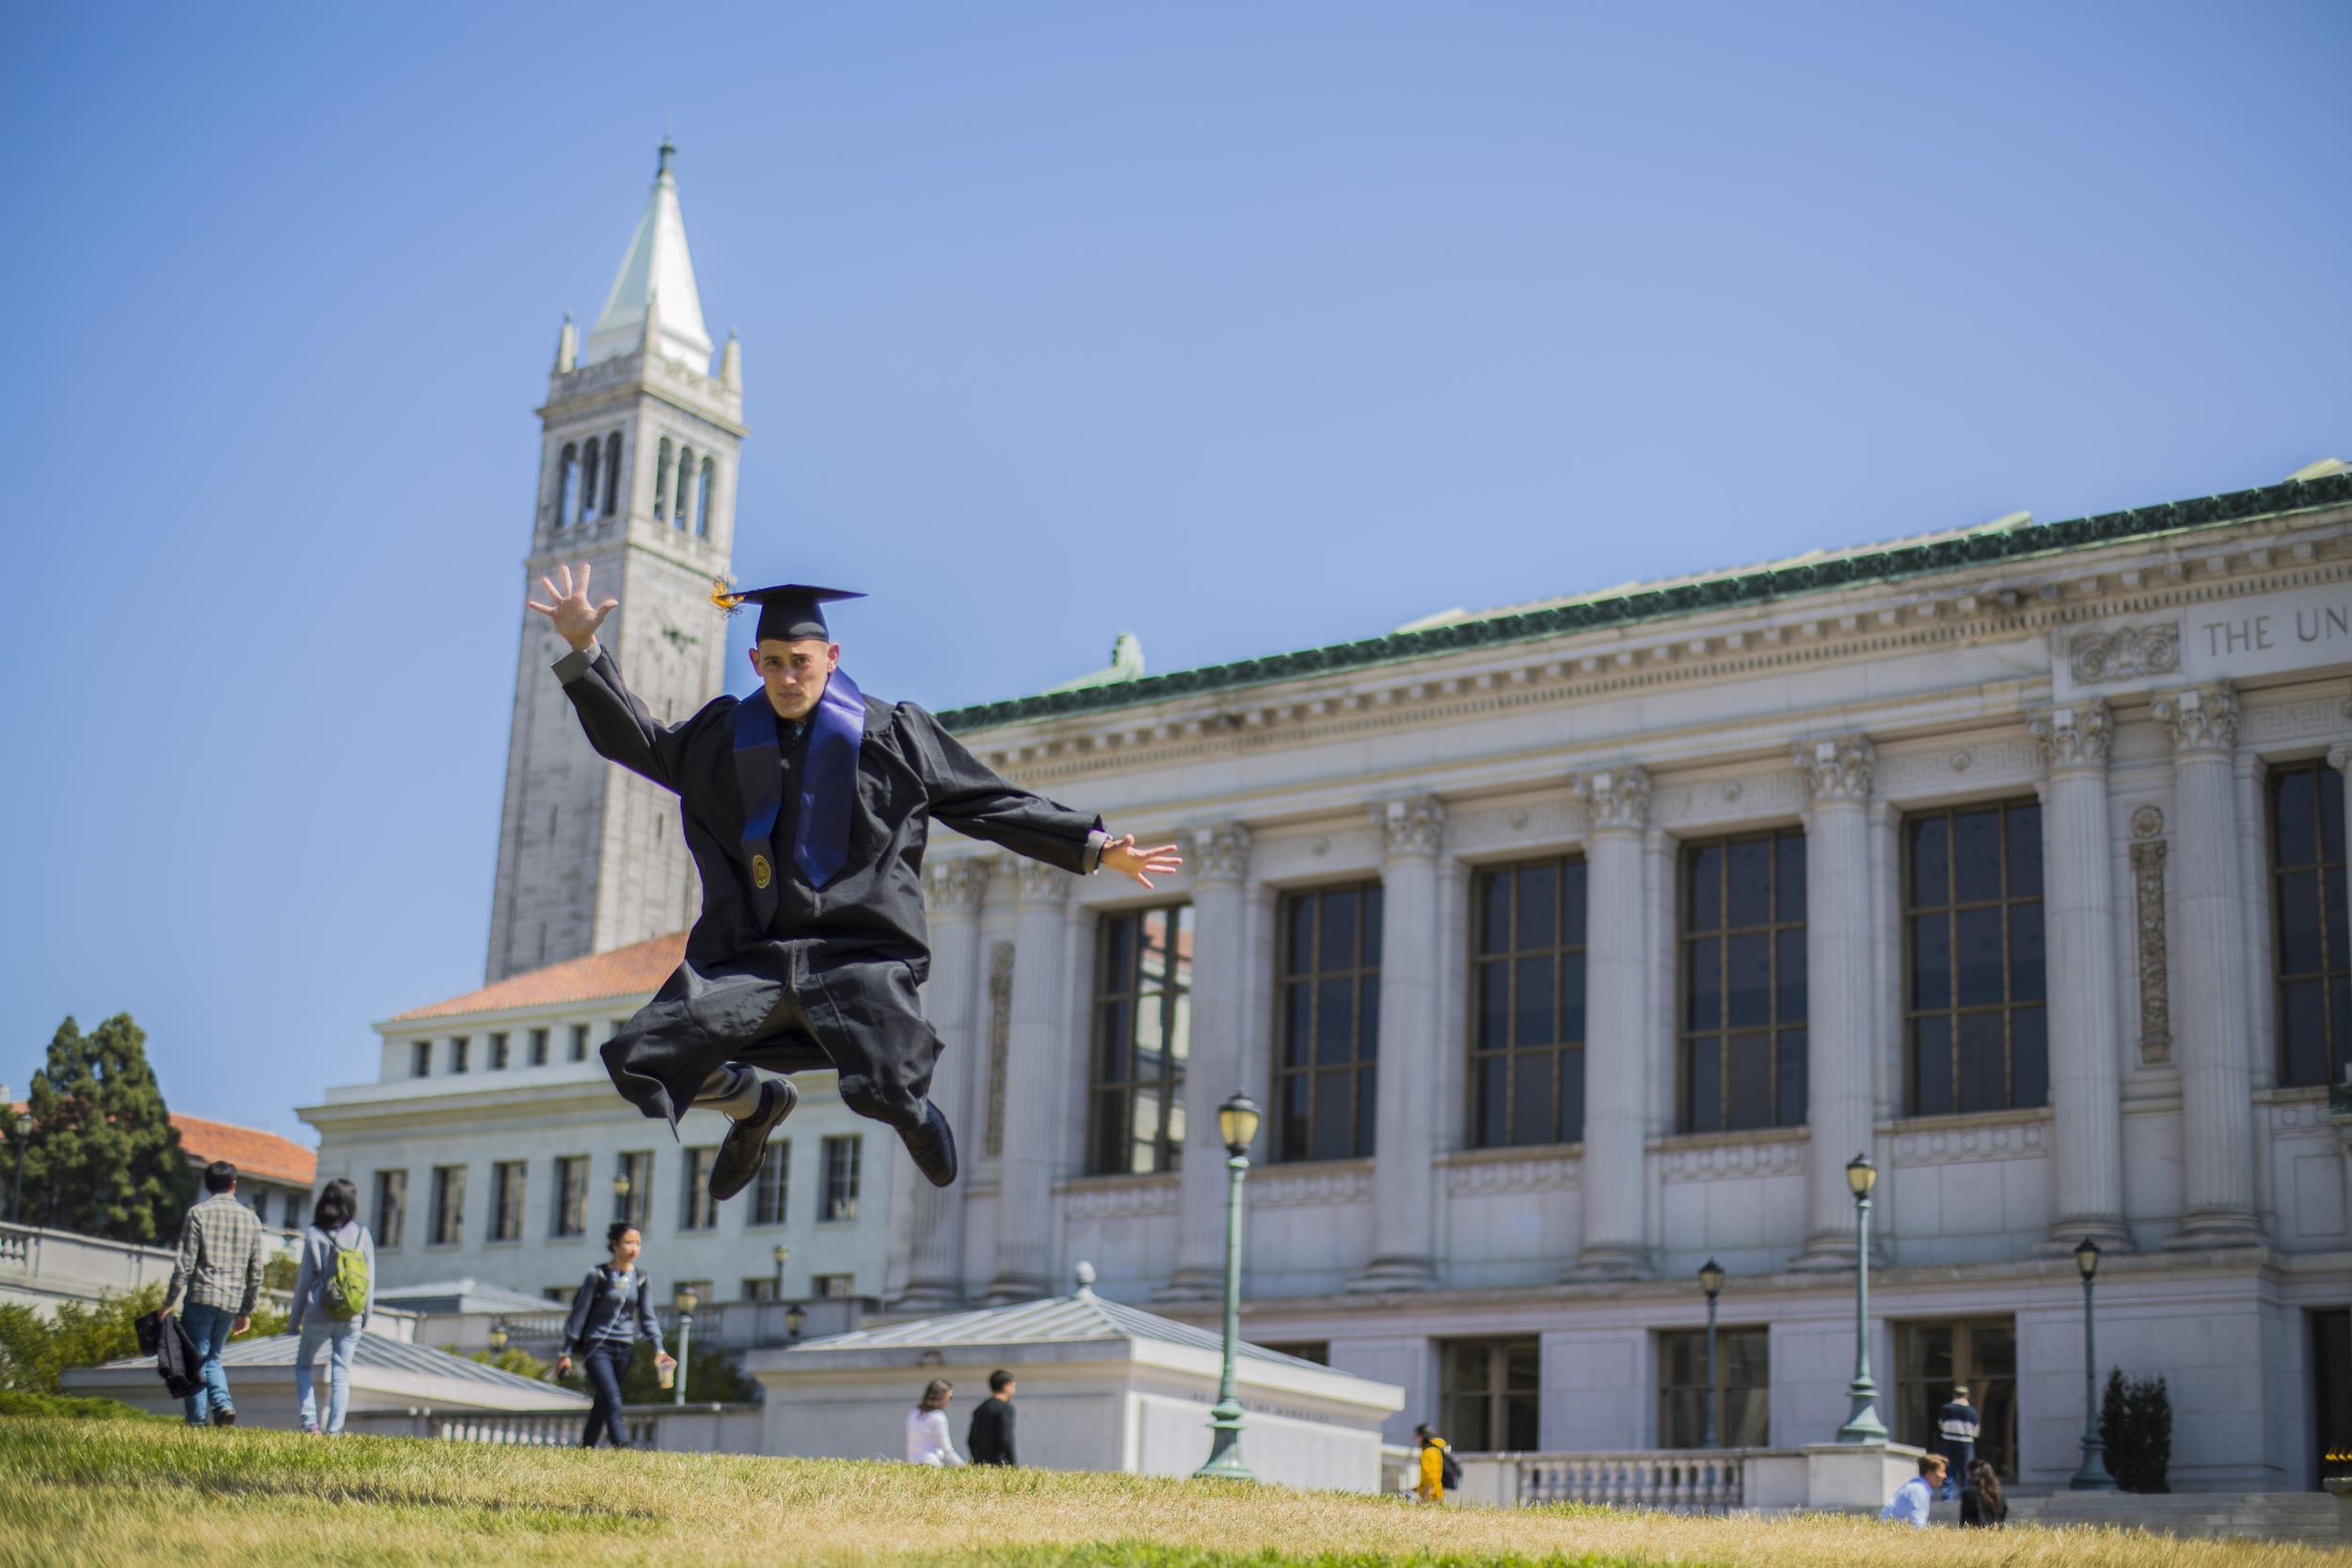 graduation_davidw99a6907_17470732191_o.jpg